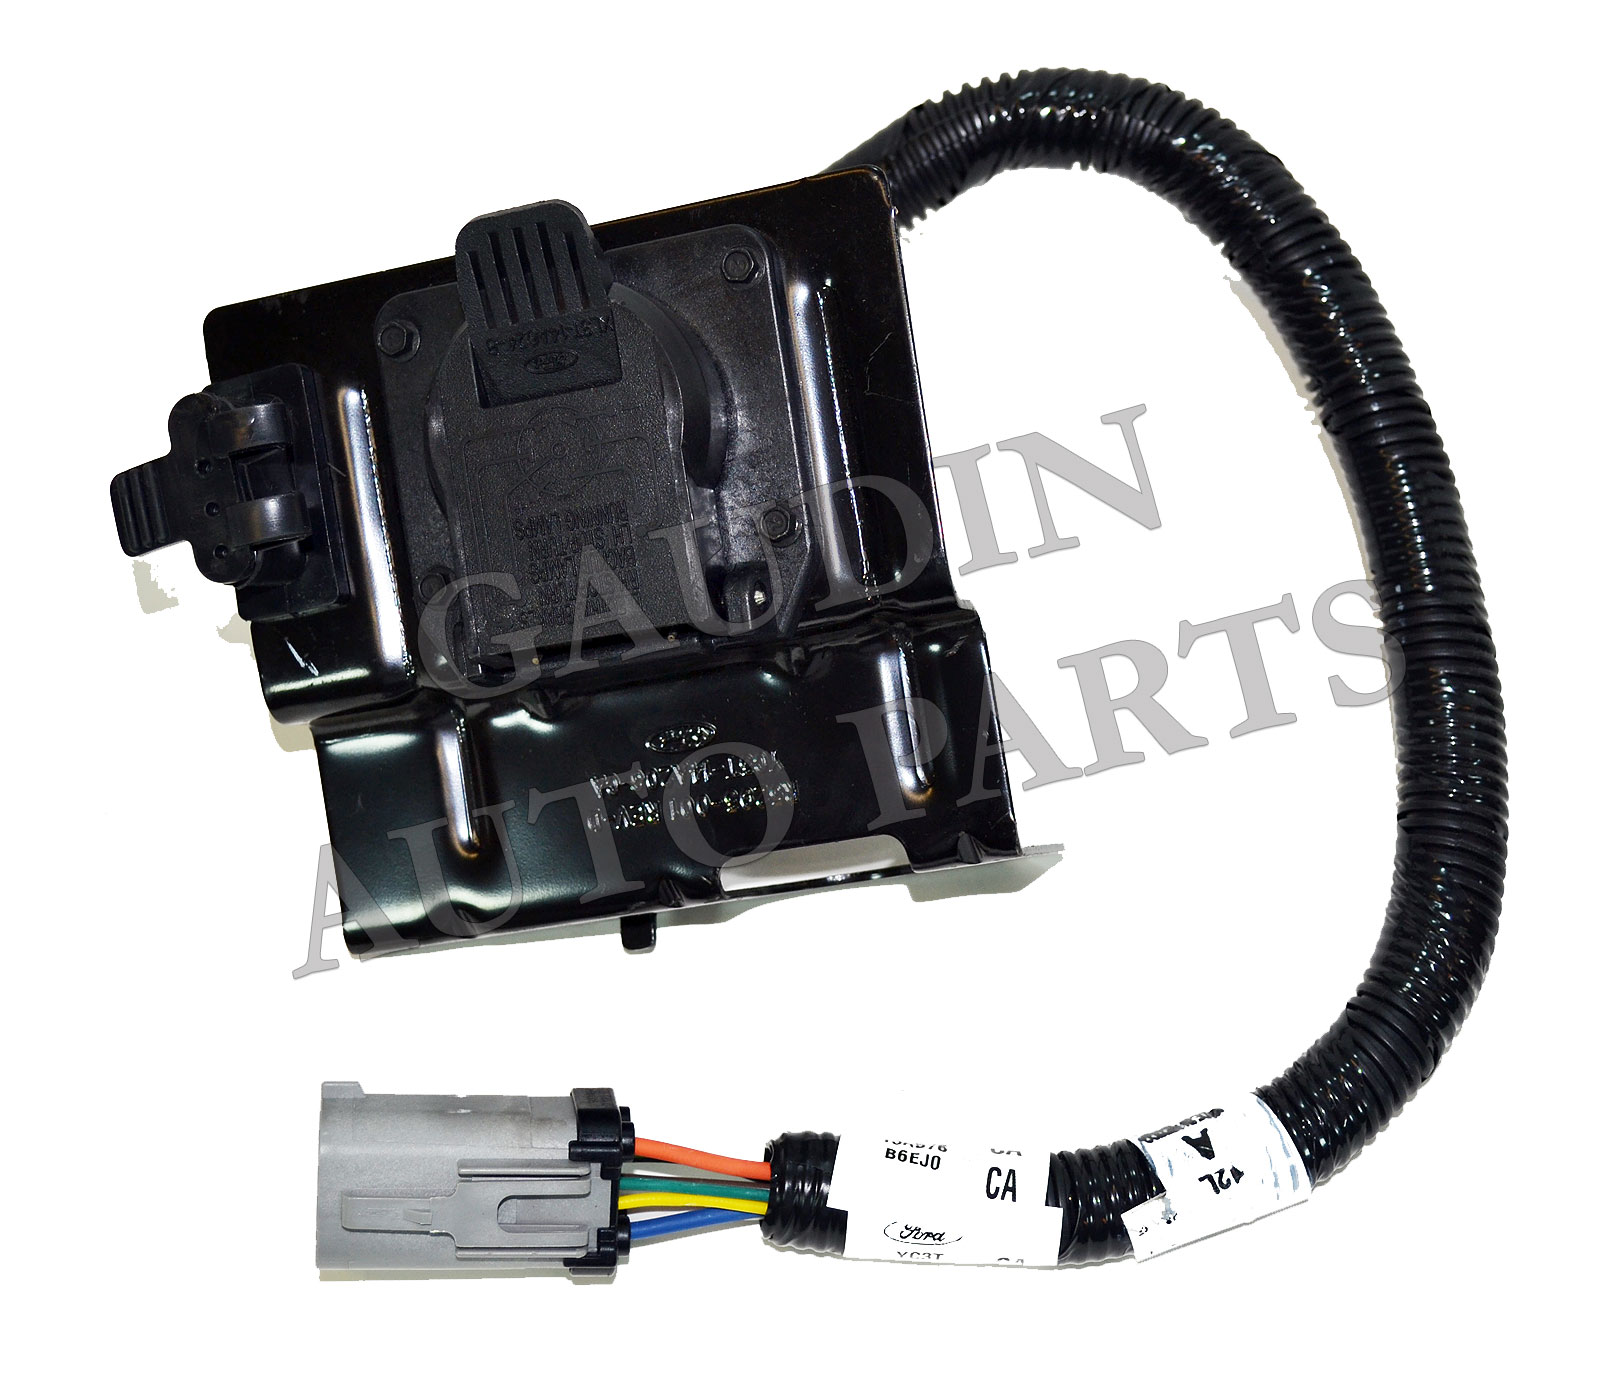 FORD OEM 99-01 F-250 Super Duty Rear Bumper-Wire Harness